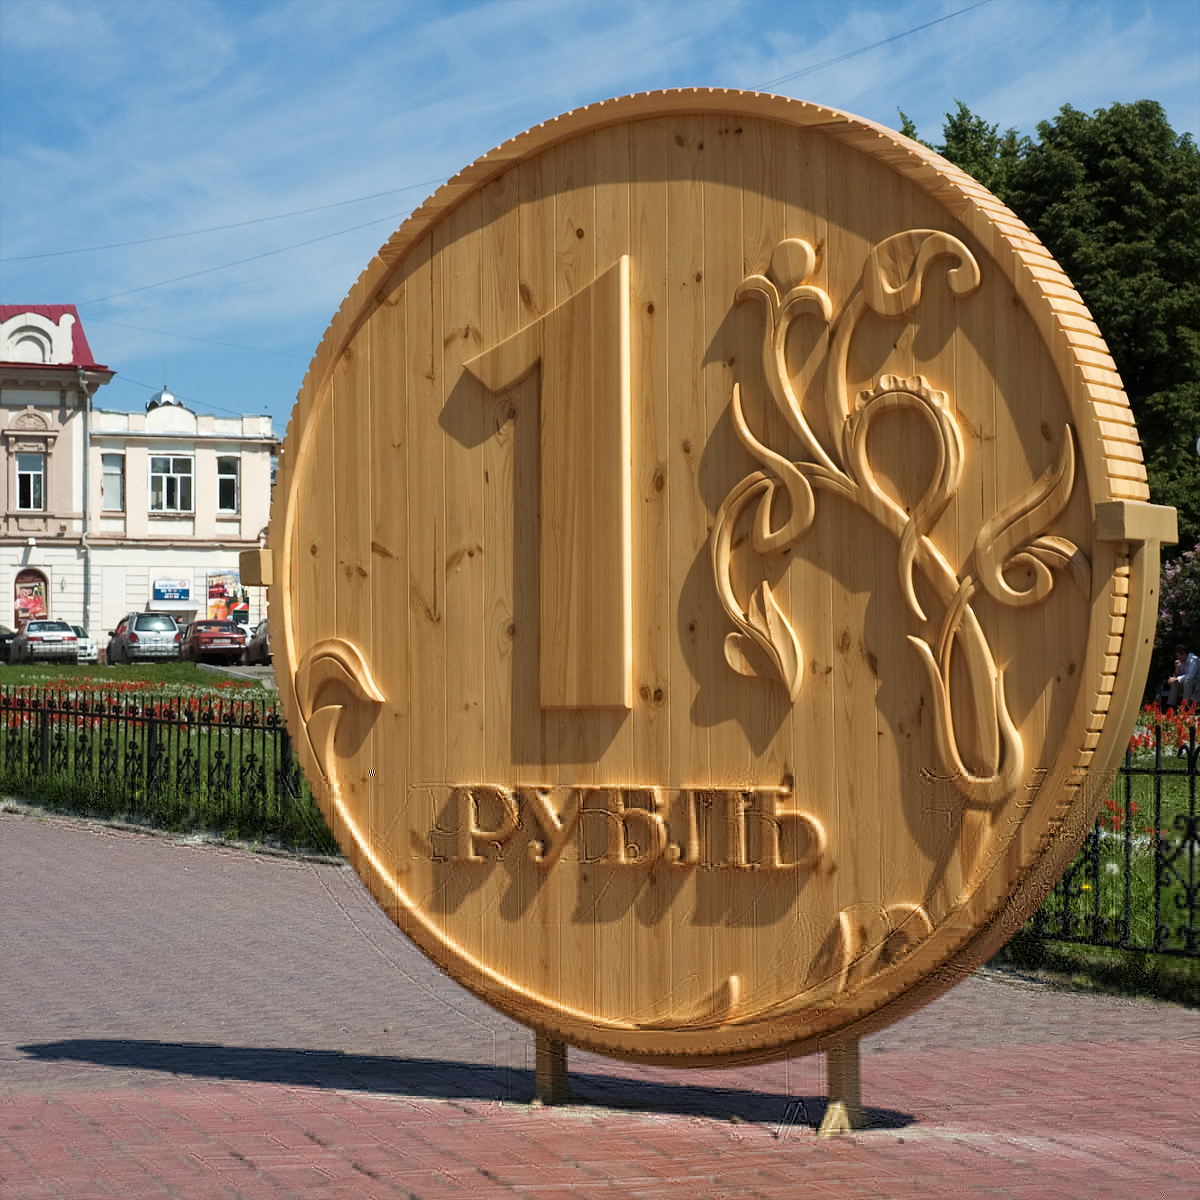 Битва при рубле: в чём смысл…